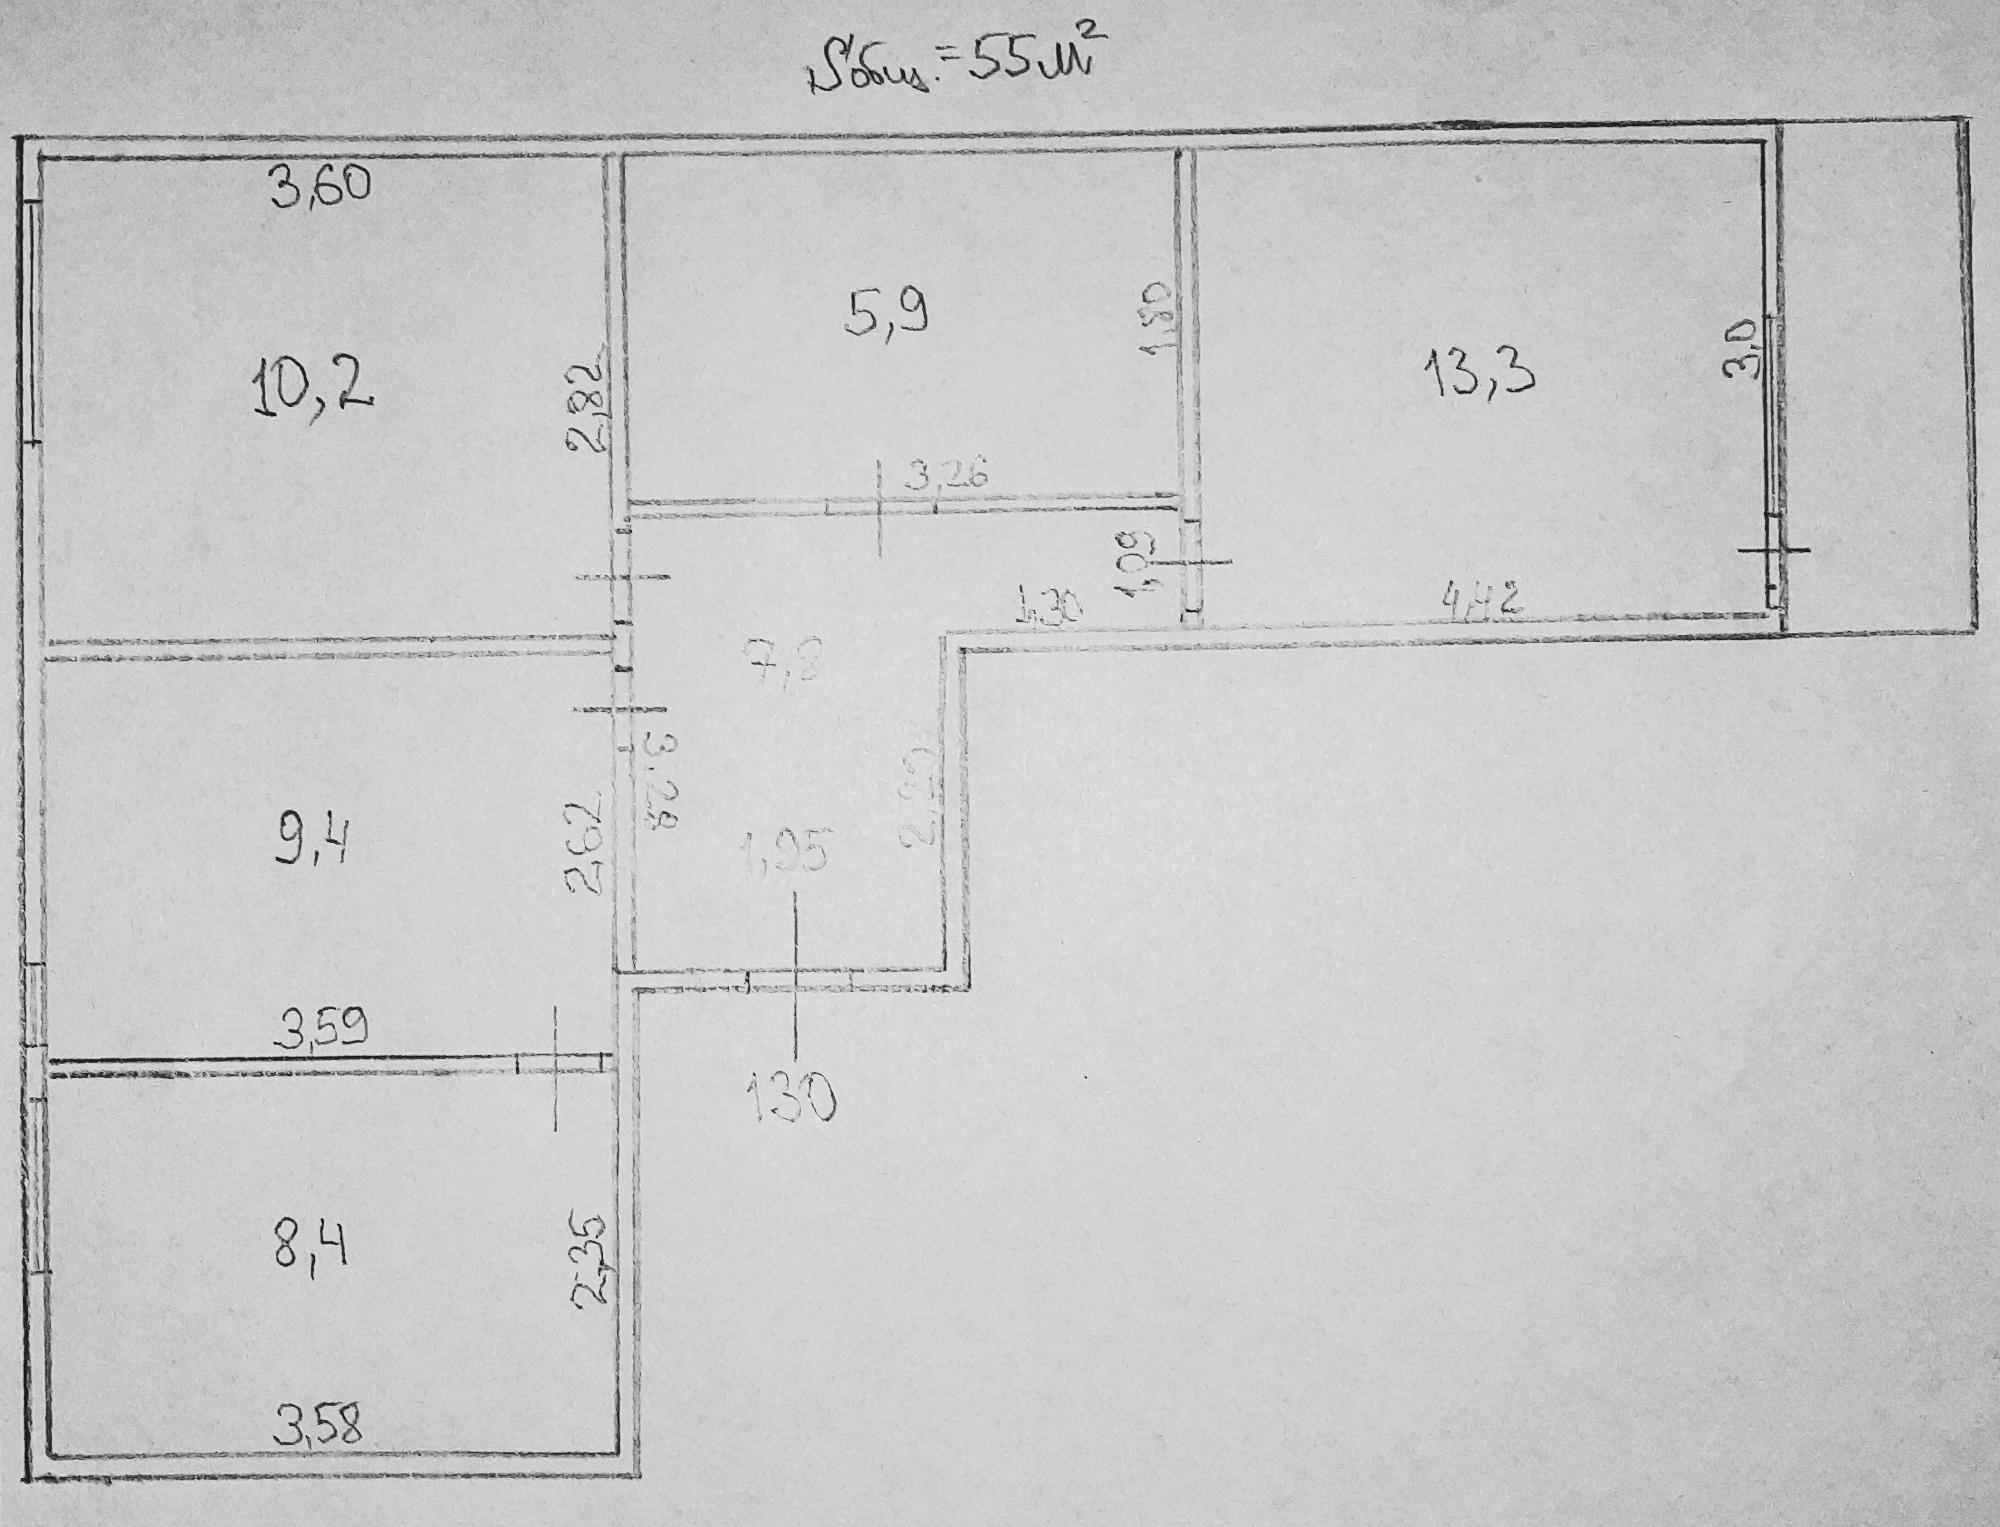 План трёхкомнатной квартиры в ЖК Красногорский